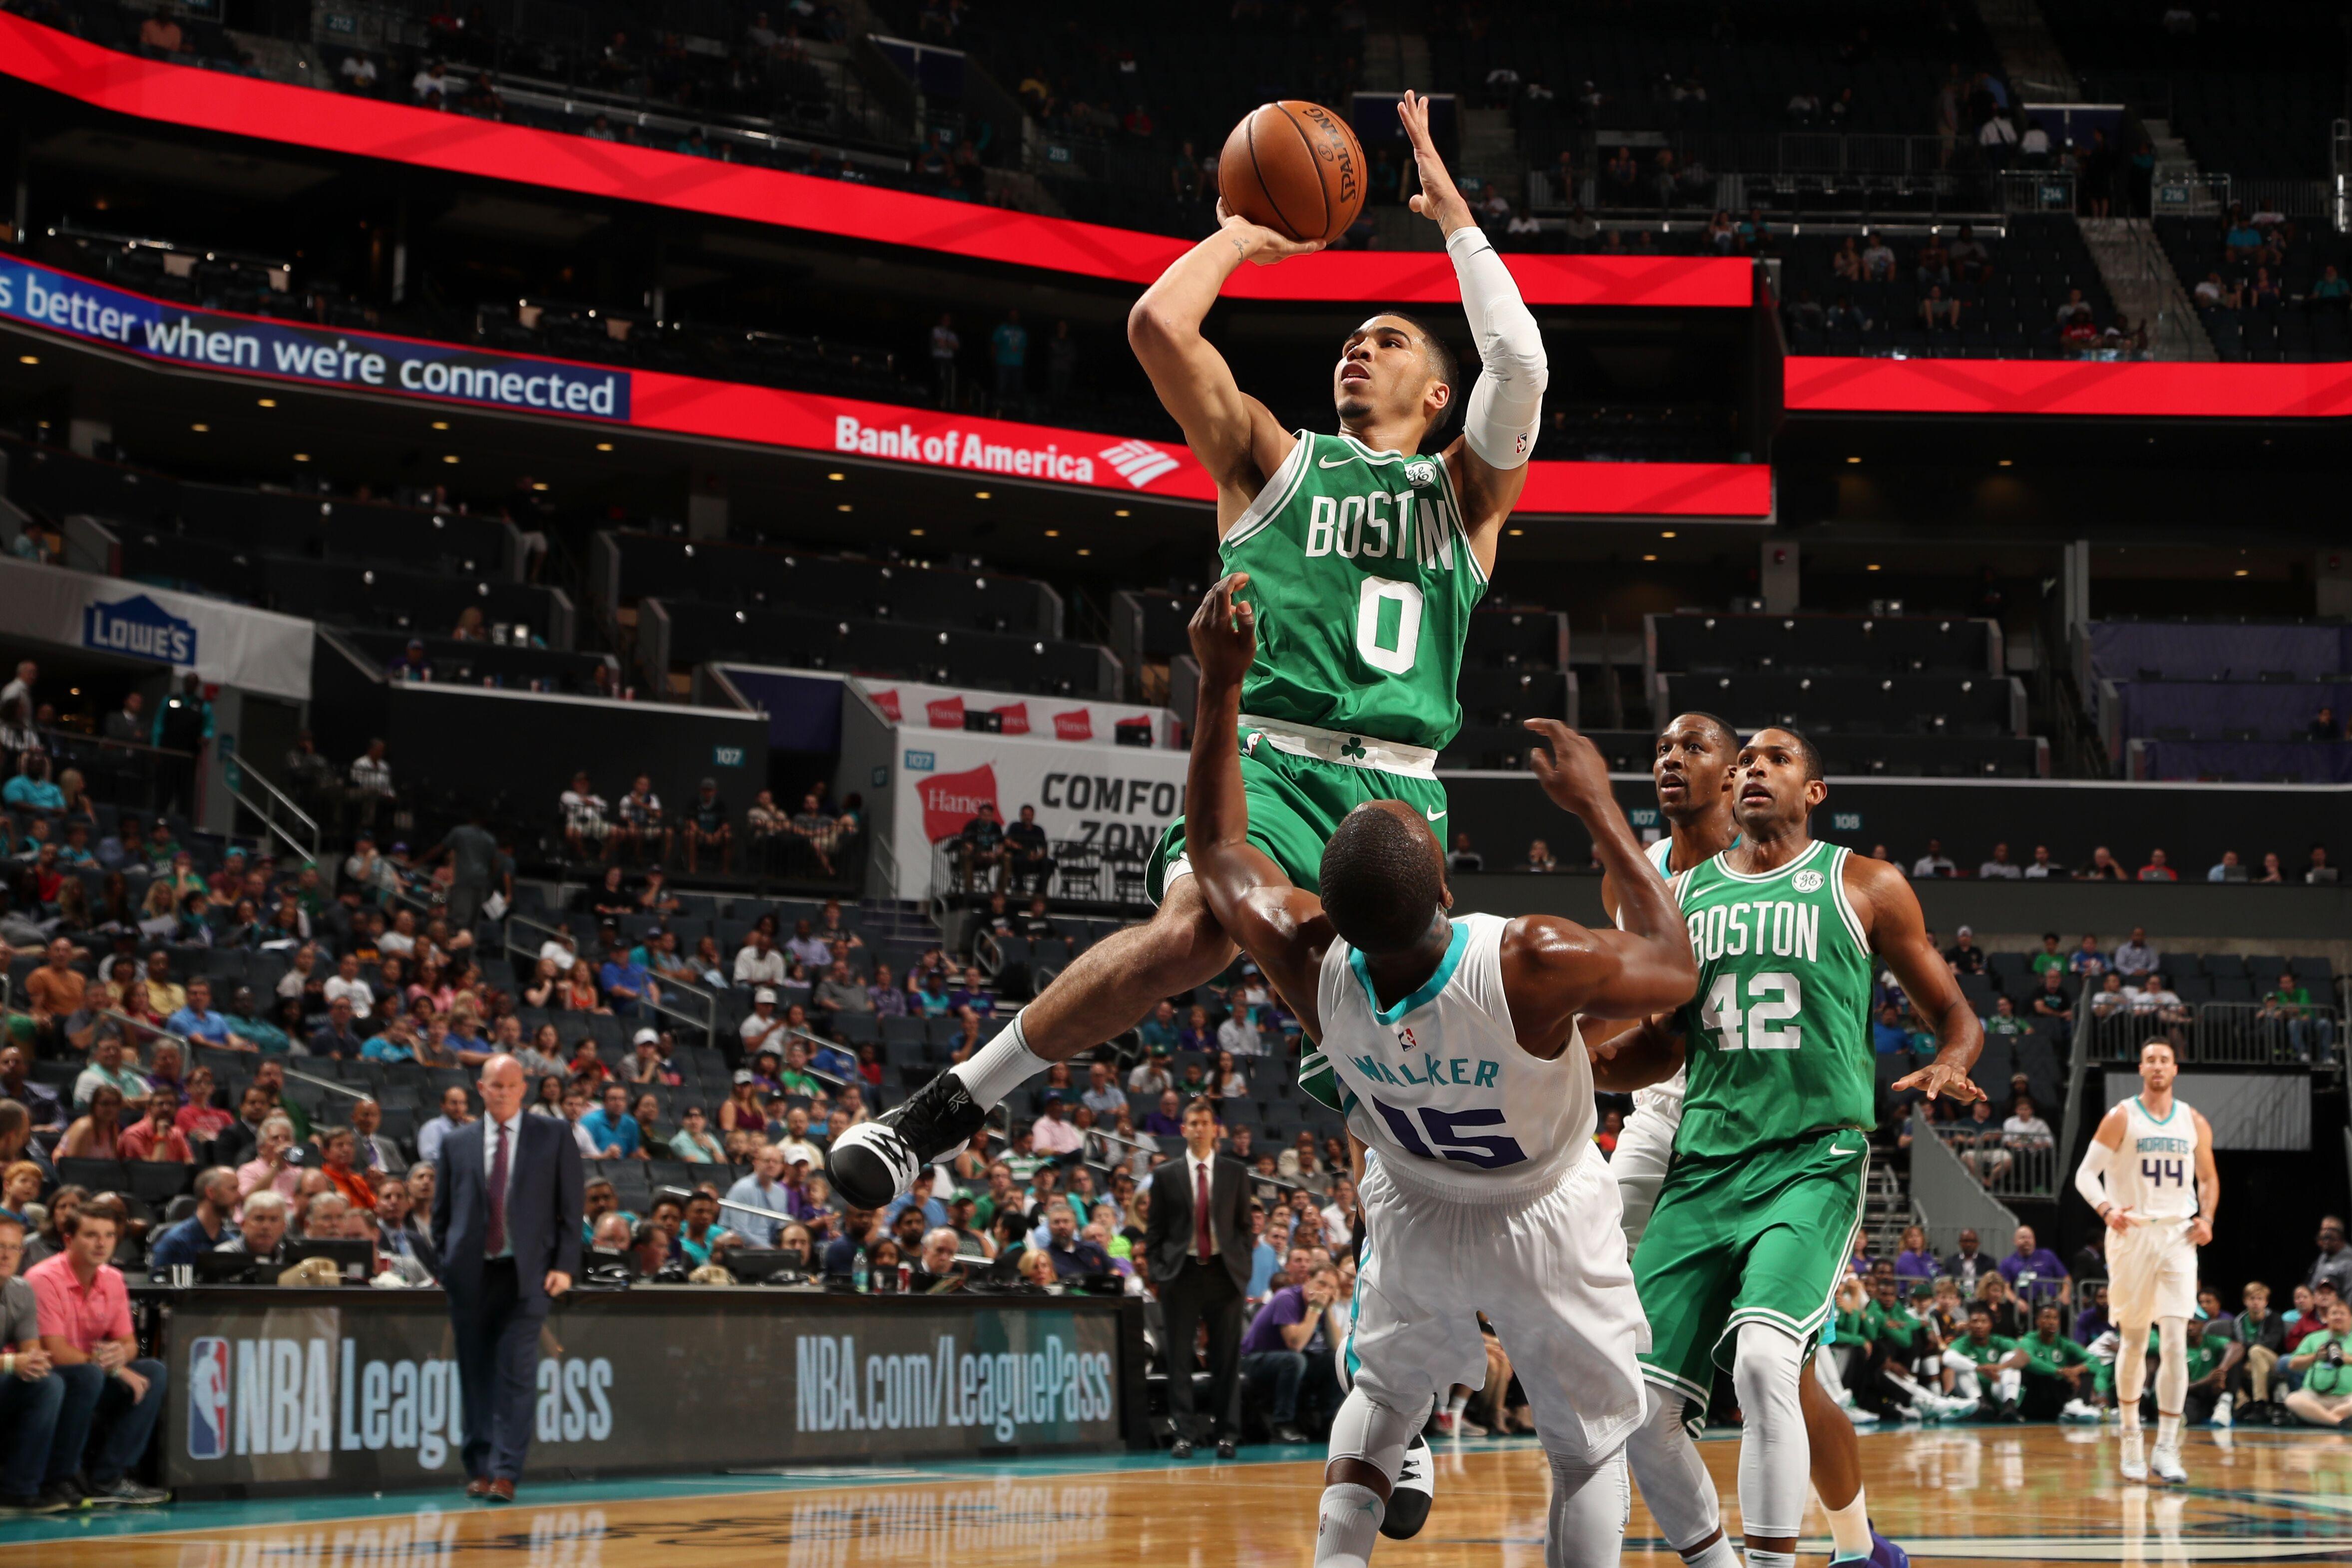 Jayson Tatum Looks Ready to start for the Boston Celtics